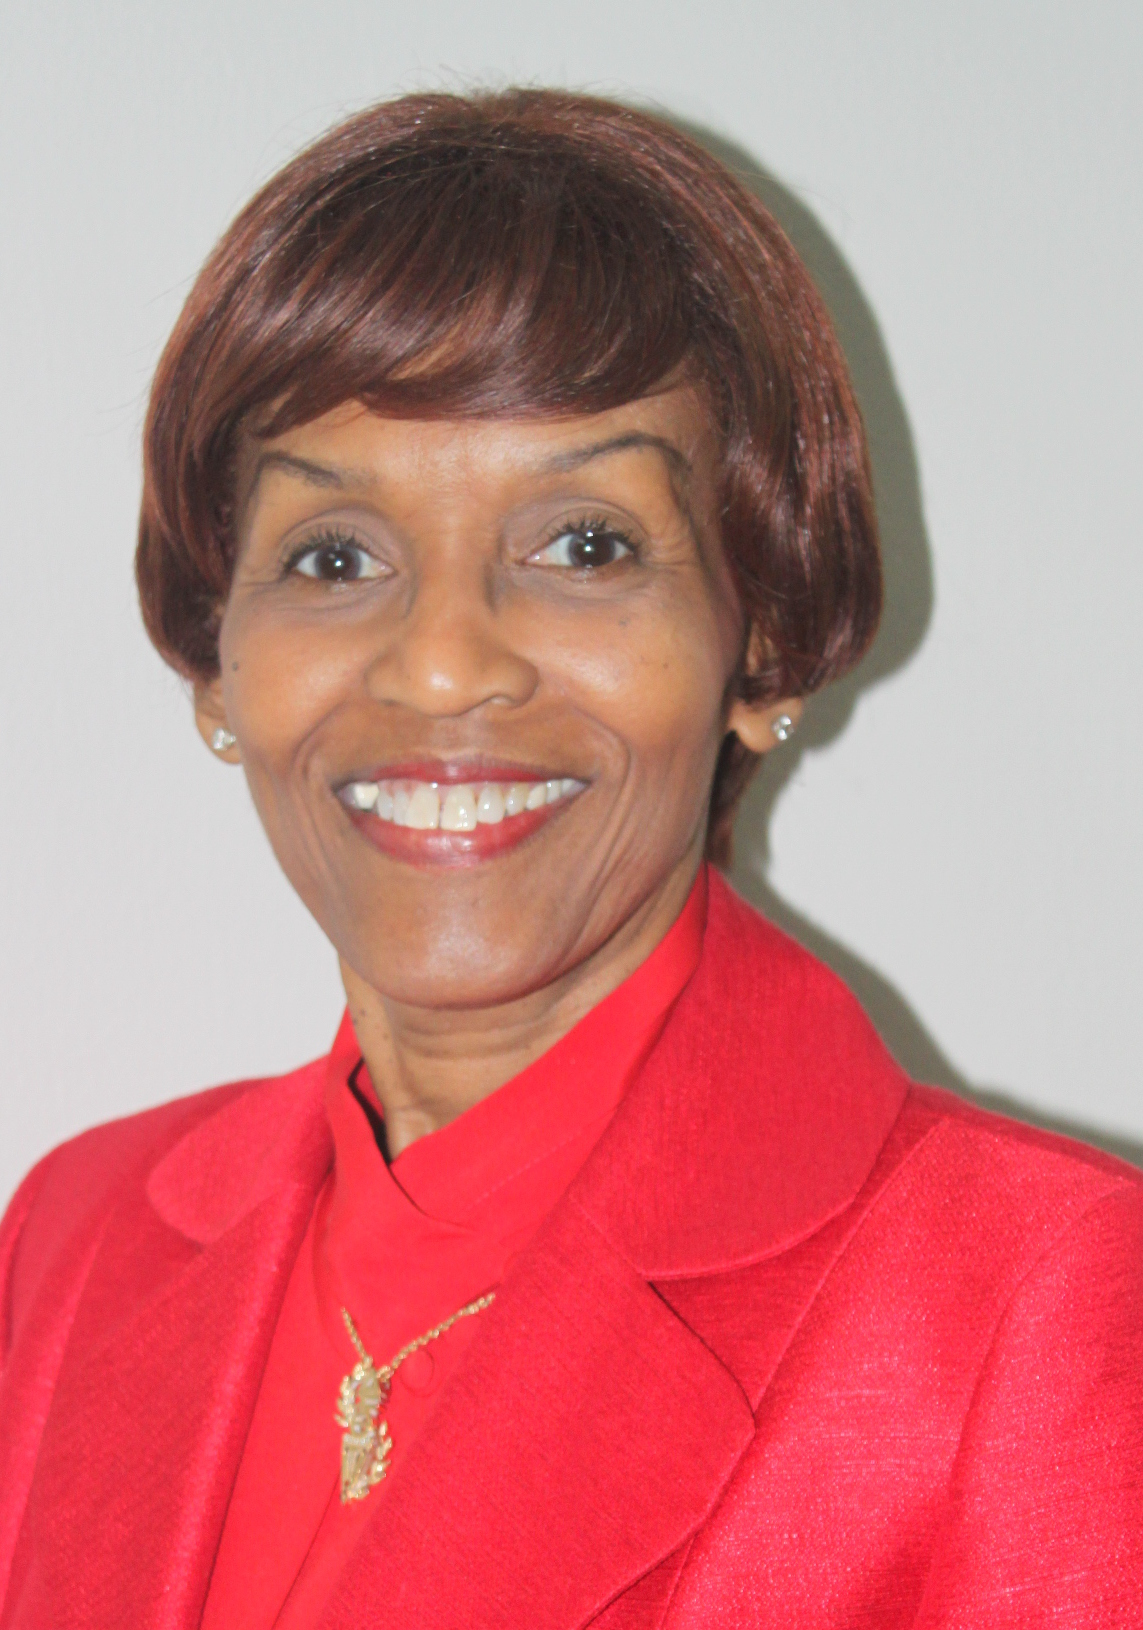 18th Dr. Mona B. Jackson 1976-1980